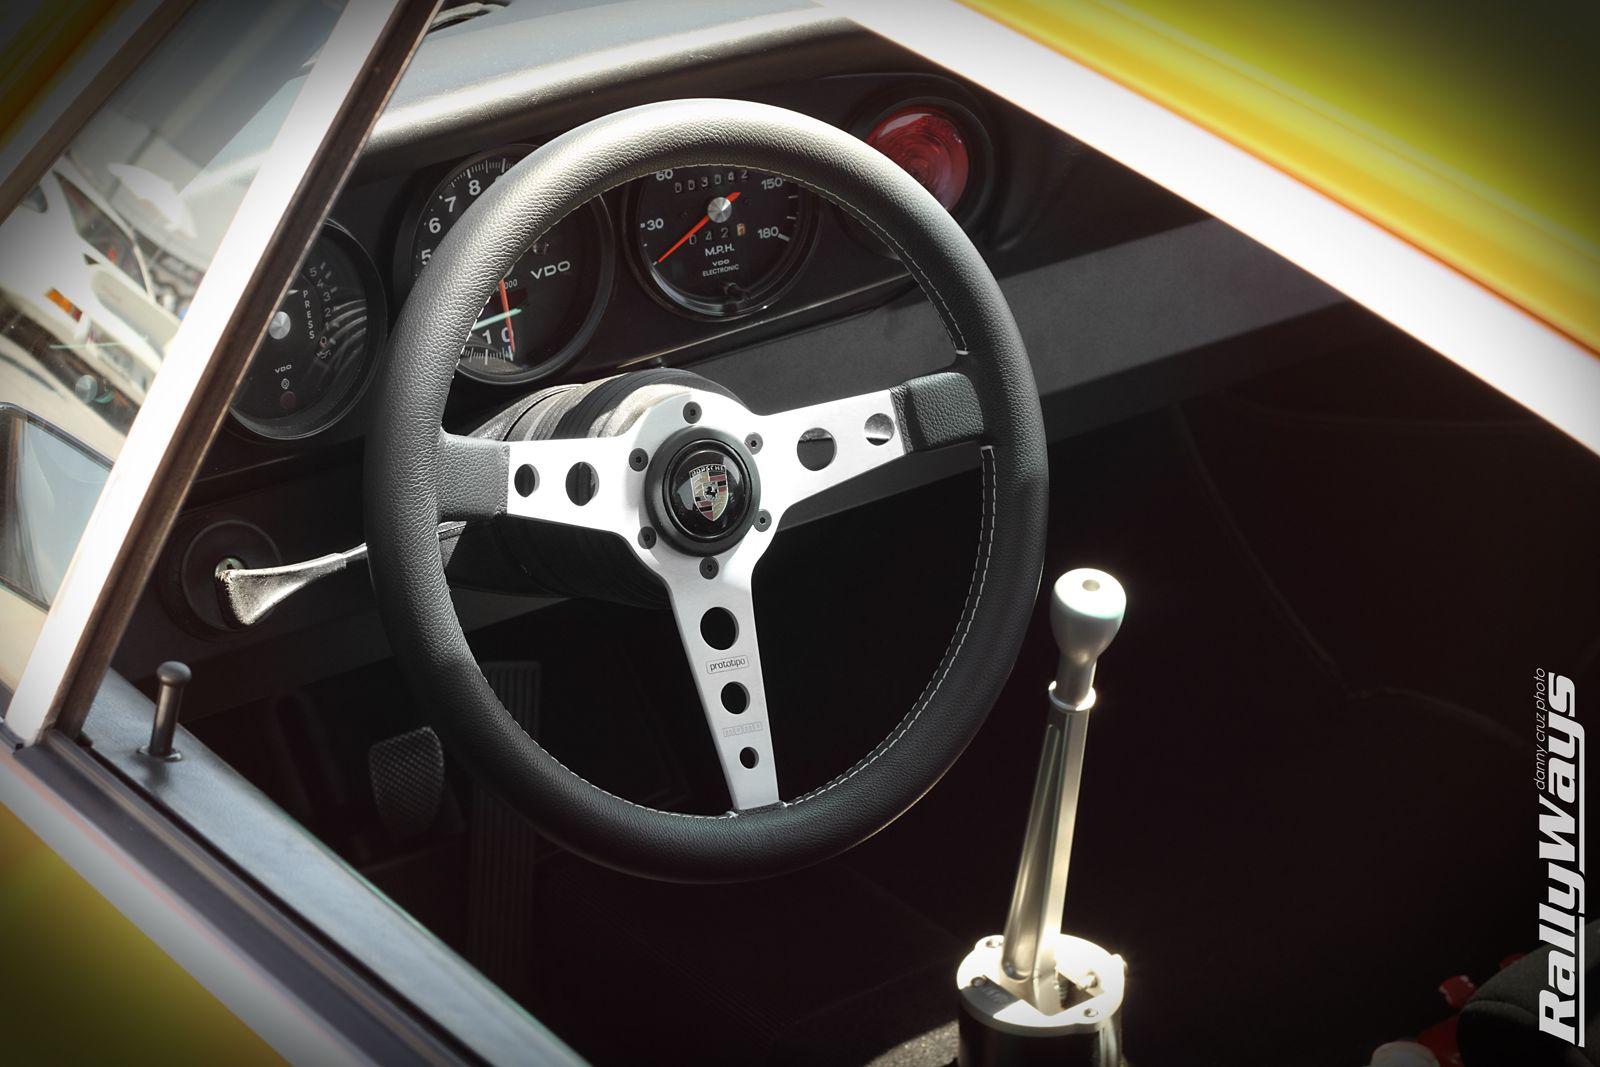 momo prototipo steering wheel in a classic 1972 porsche. Black Bedroom Furniture Sets. Home Design Ideas